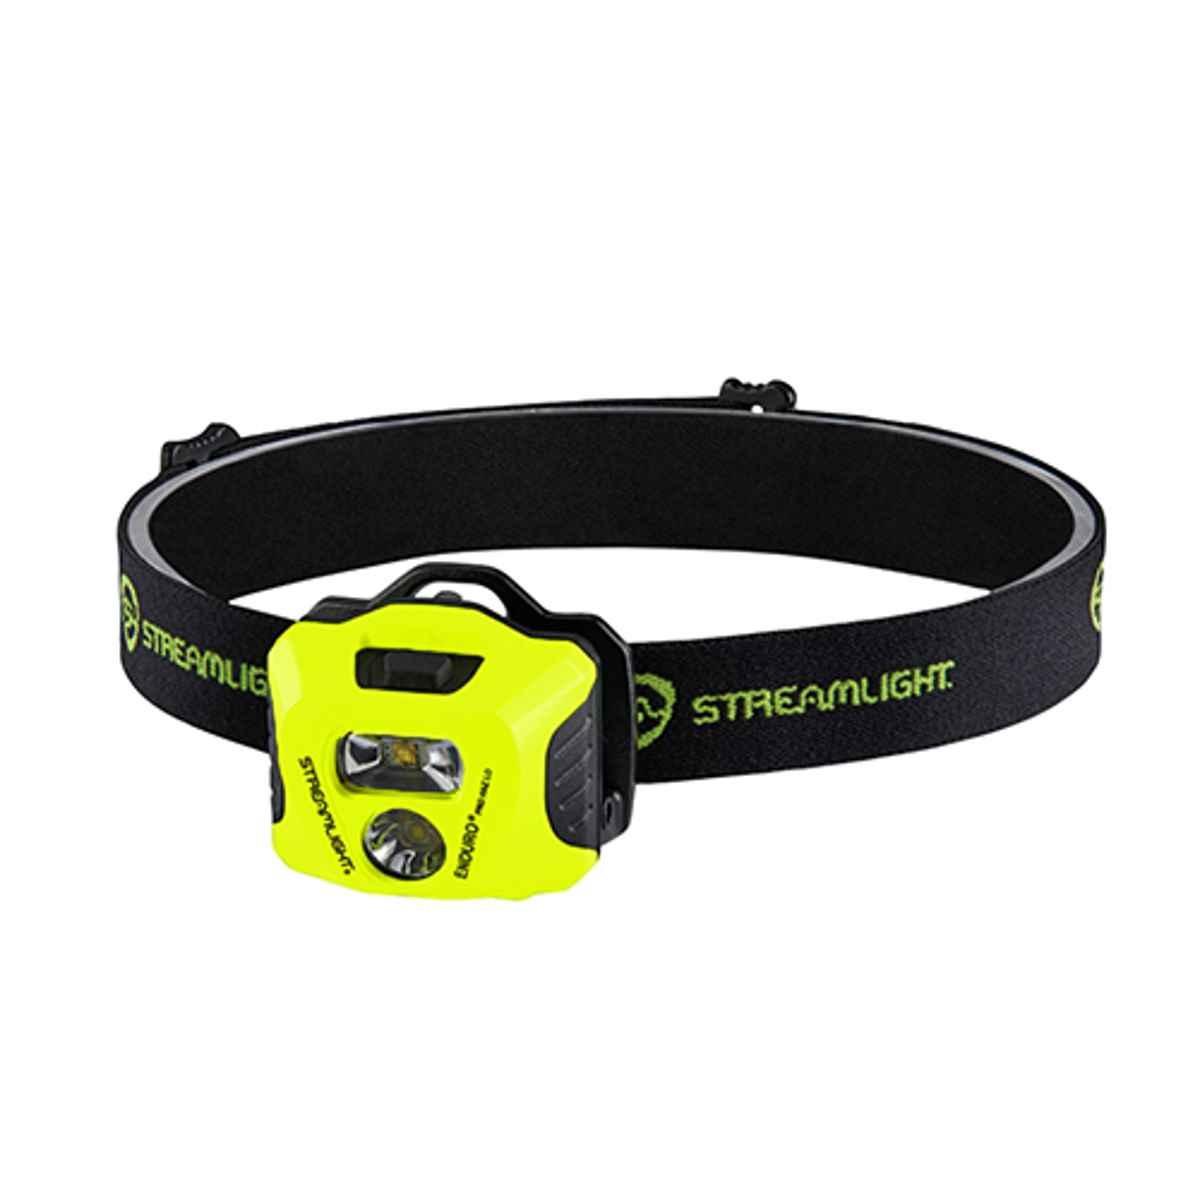 Streamlight Endura Pro Haz-Lo Low Profile Multi Function Headlamp - Yellow - 61424